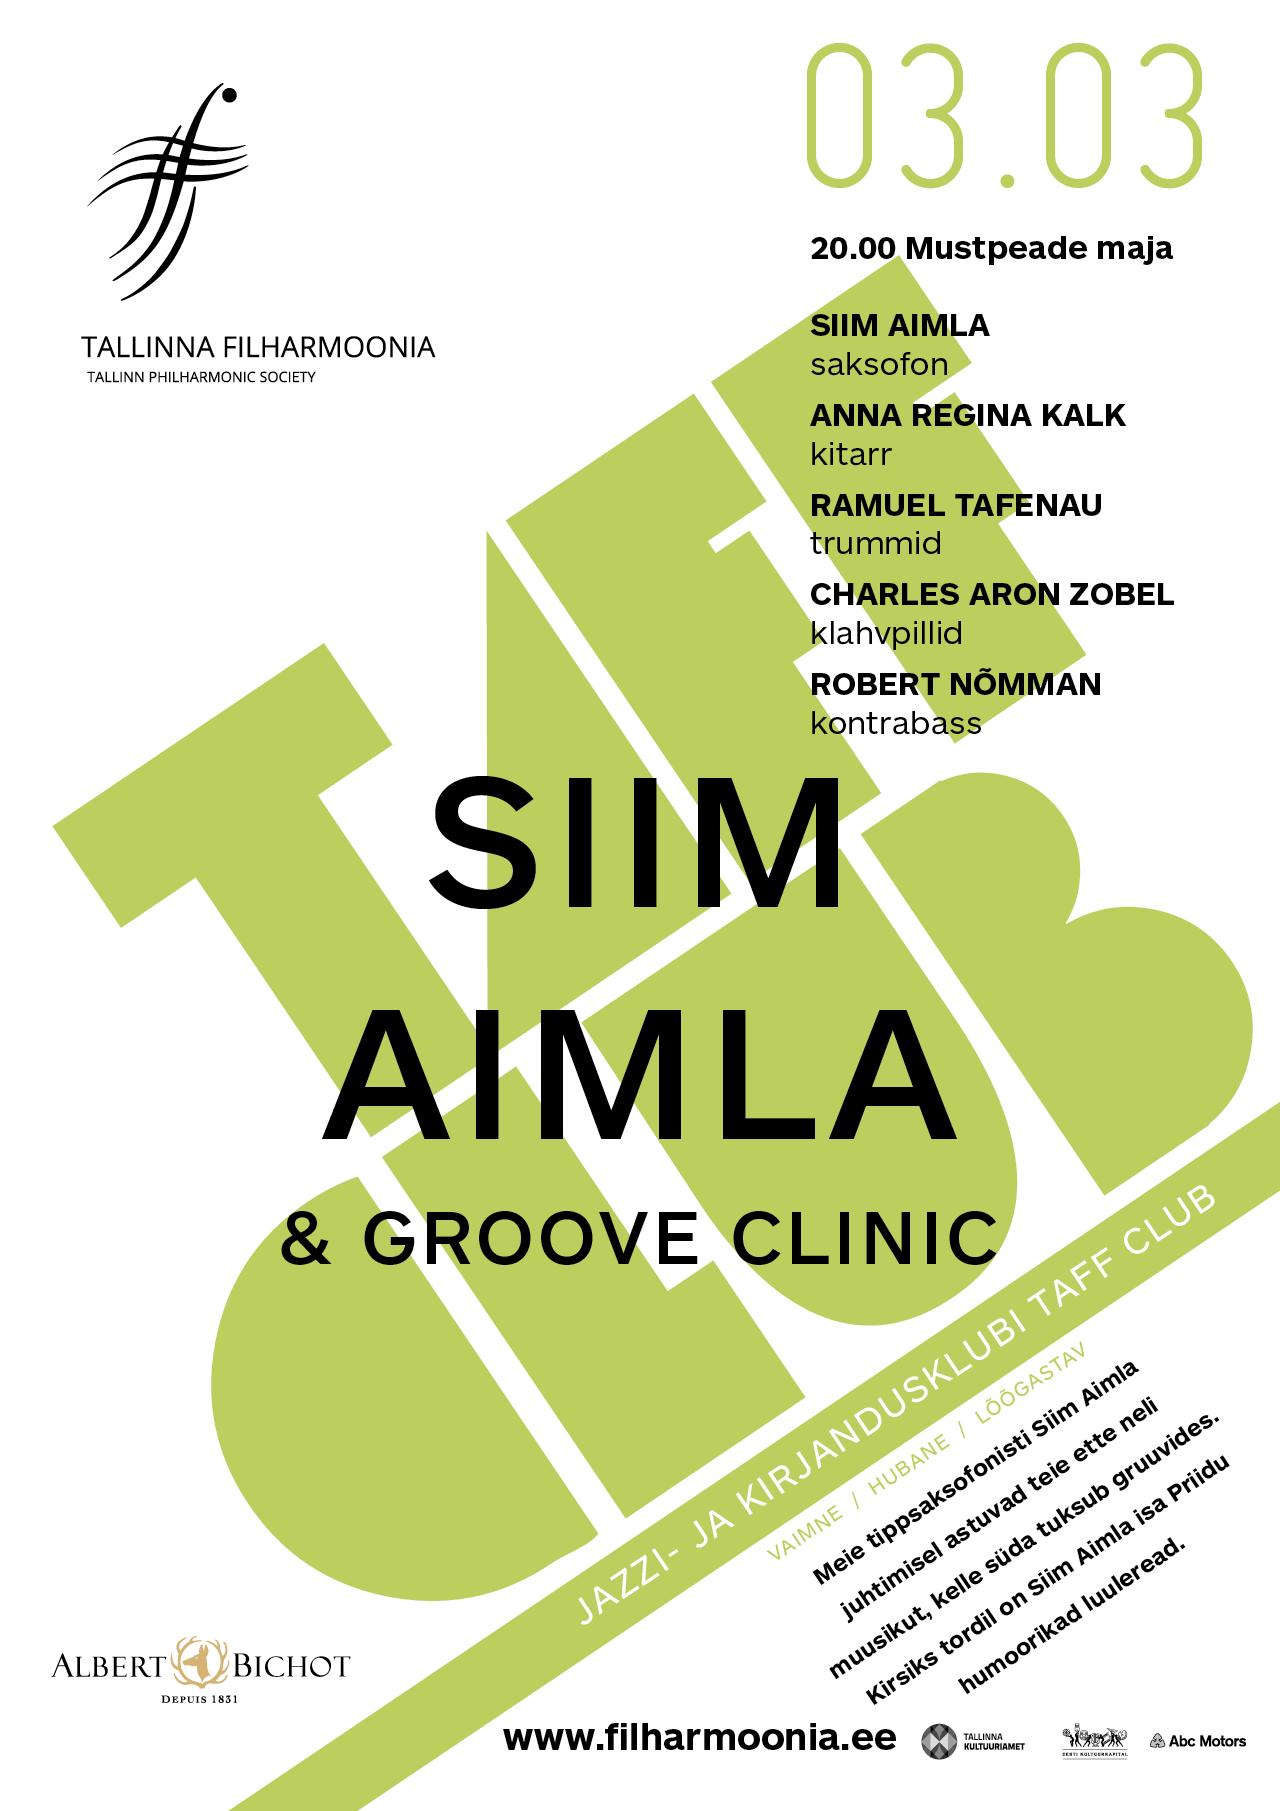 TAFF CLUB. SIIM AIMLA & GROOVE CLINIC